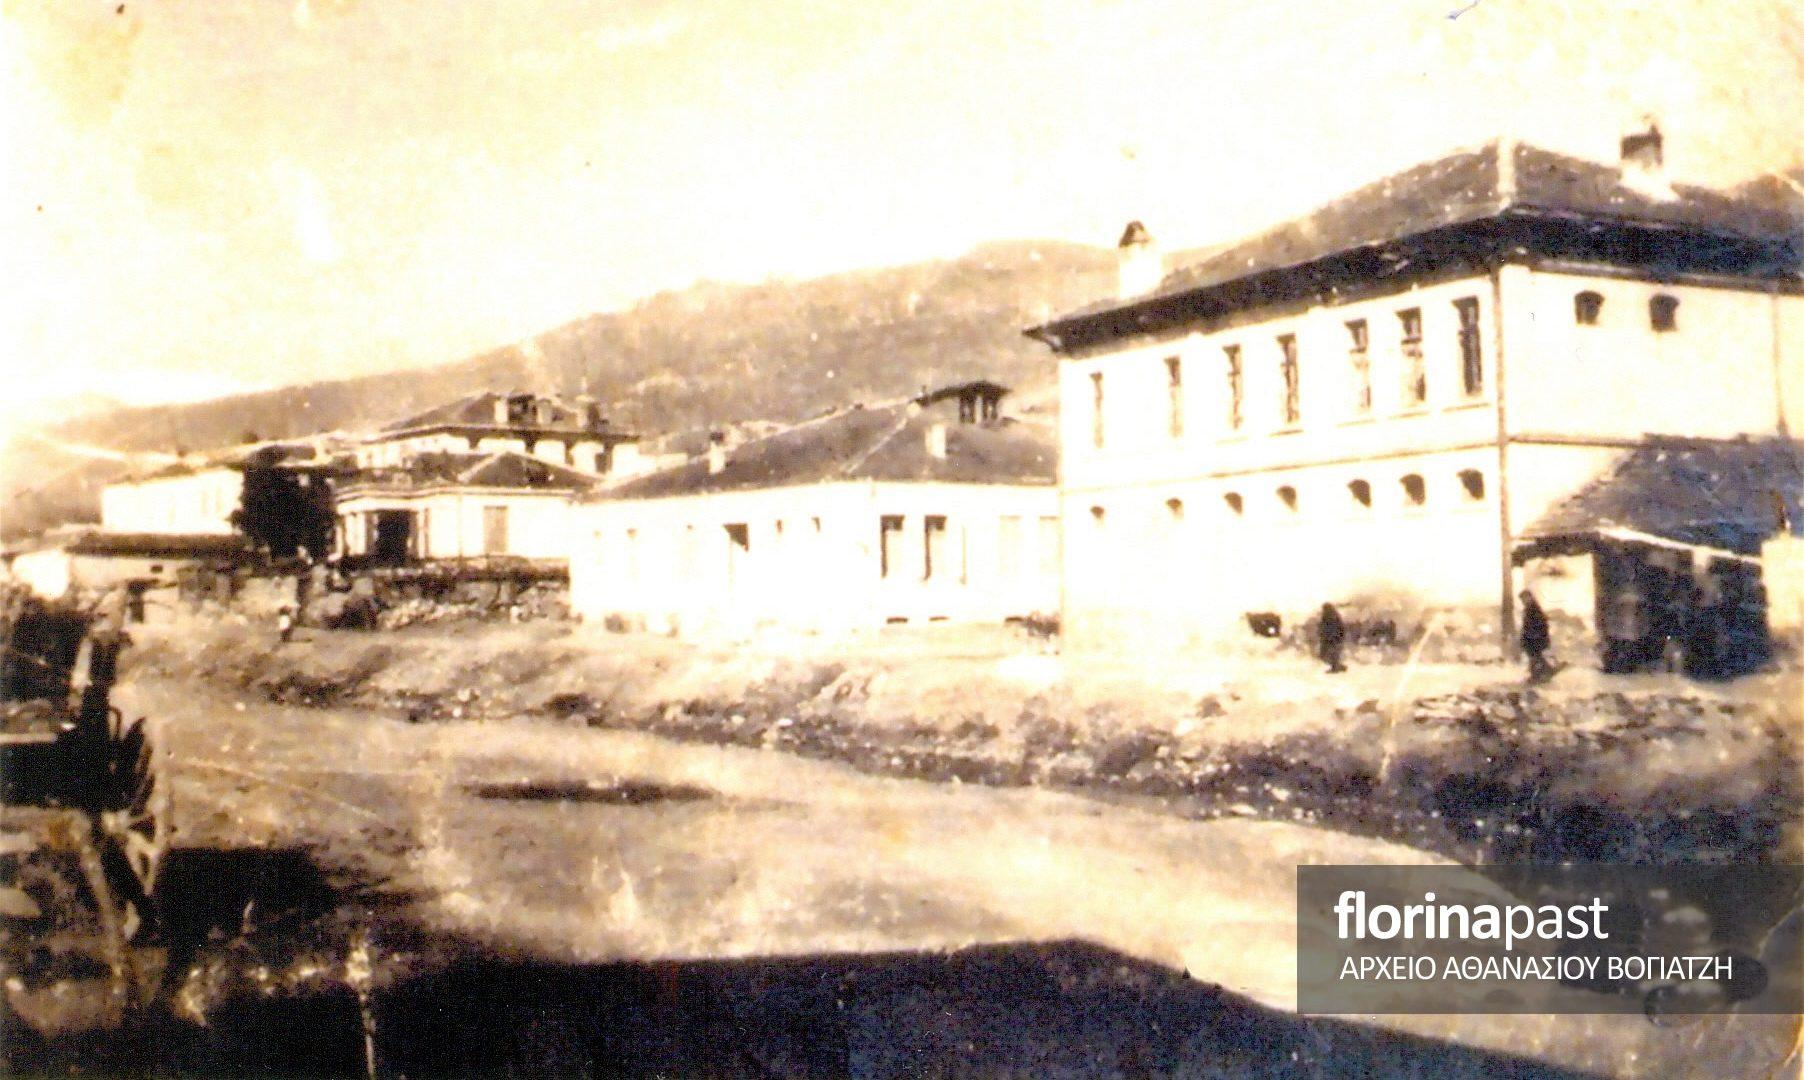 florinapast